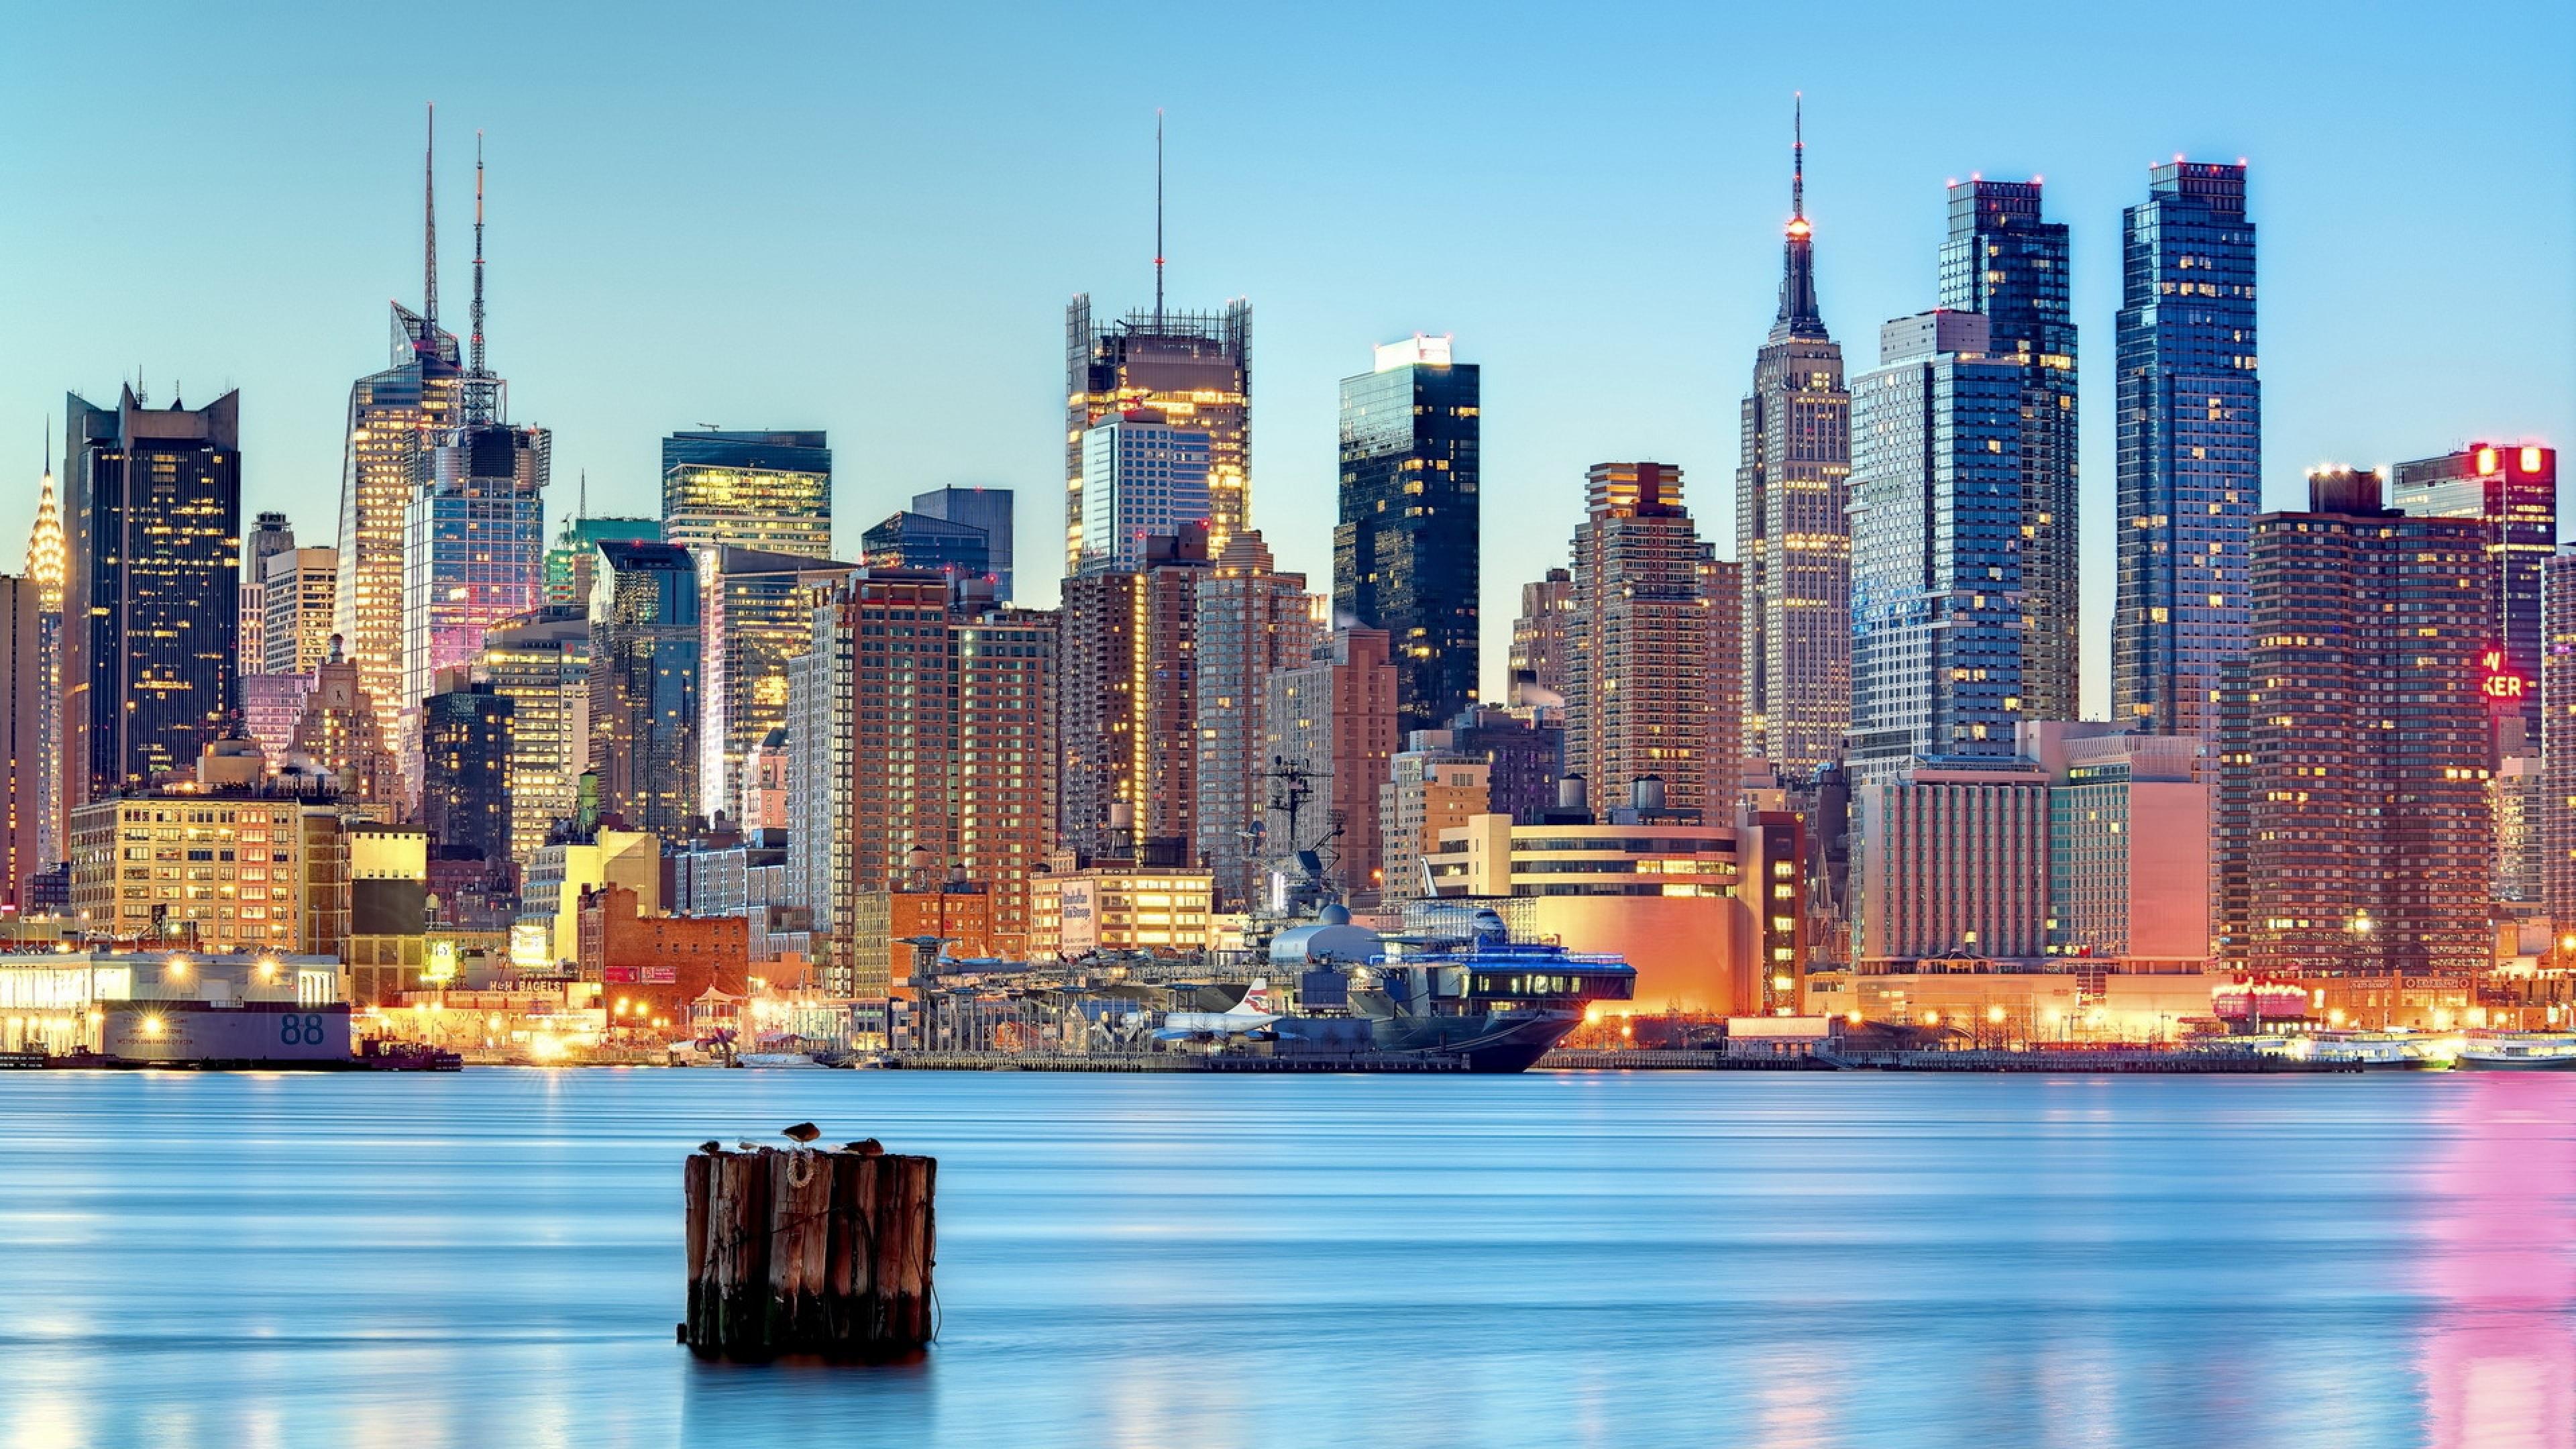 Download Usa New Jersey Weehawken New York Wallpaper Background 4k